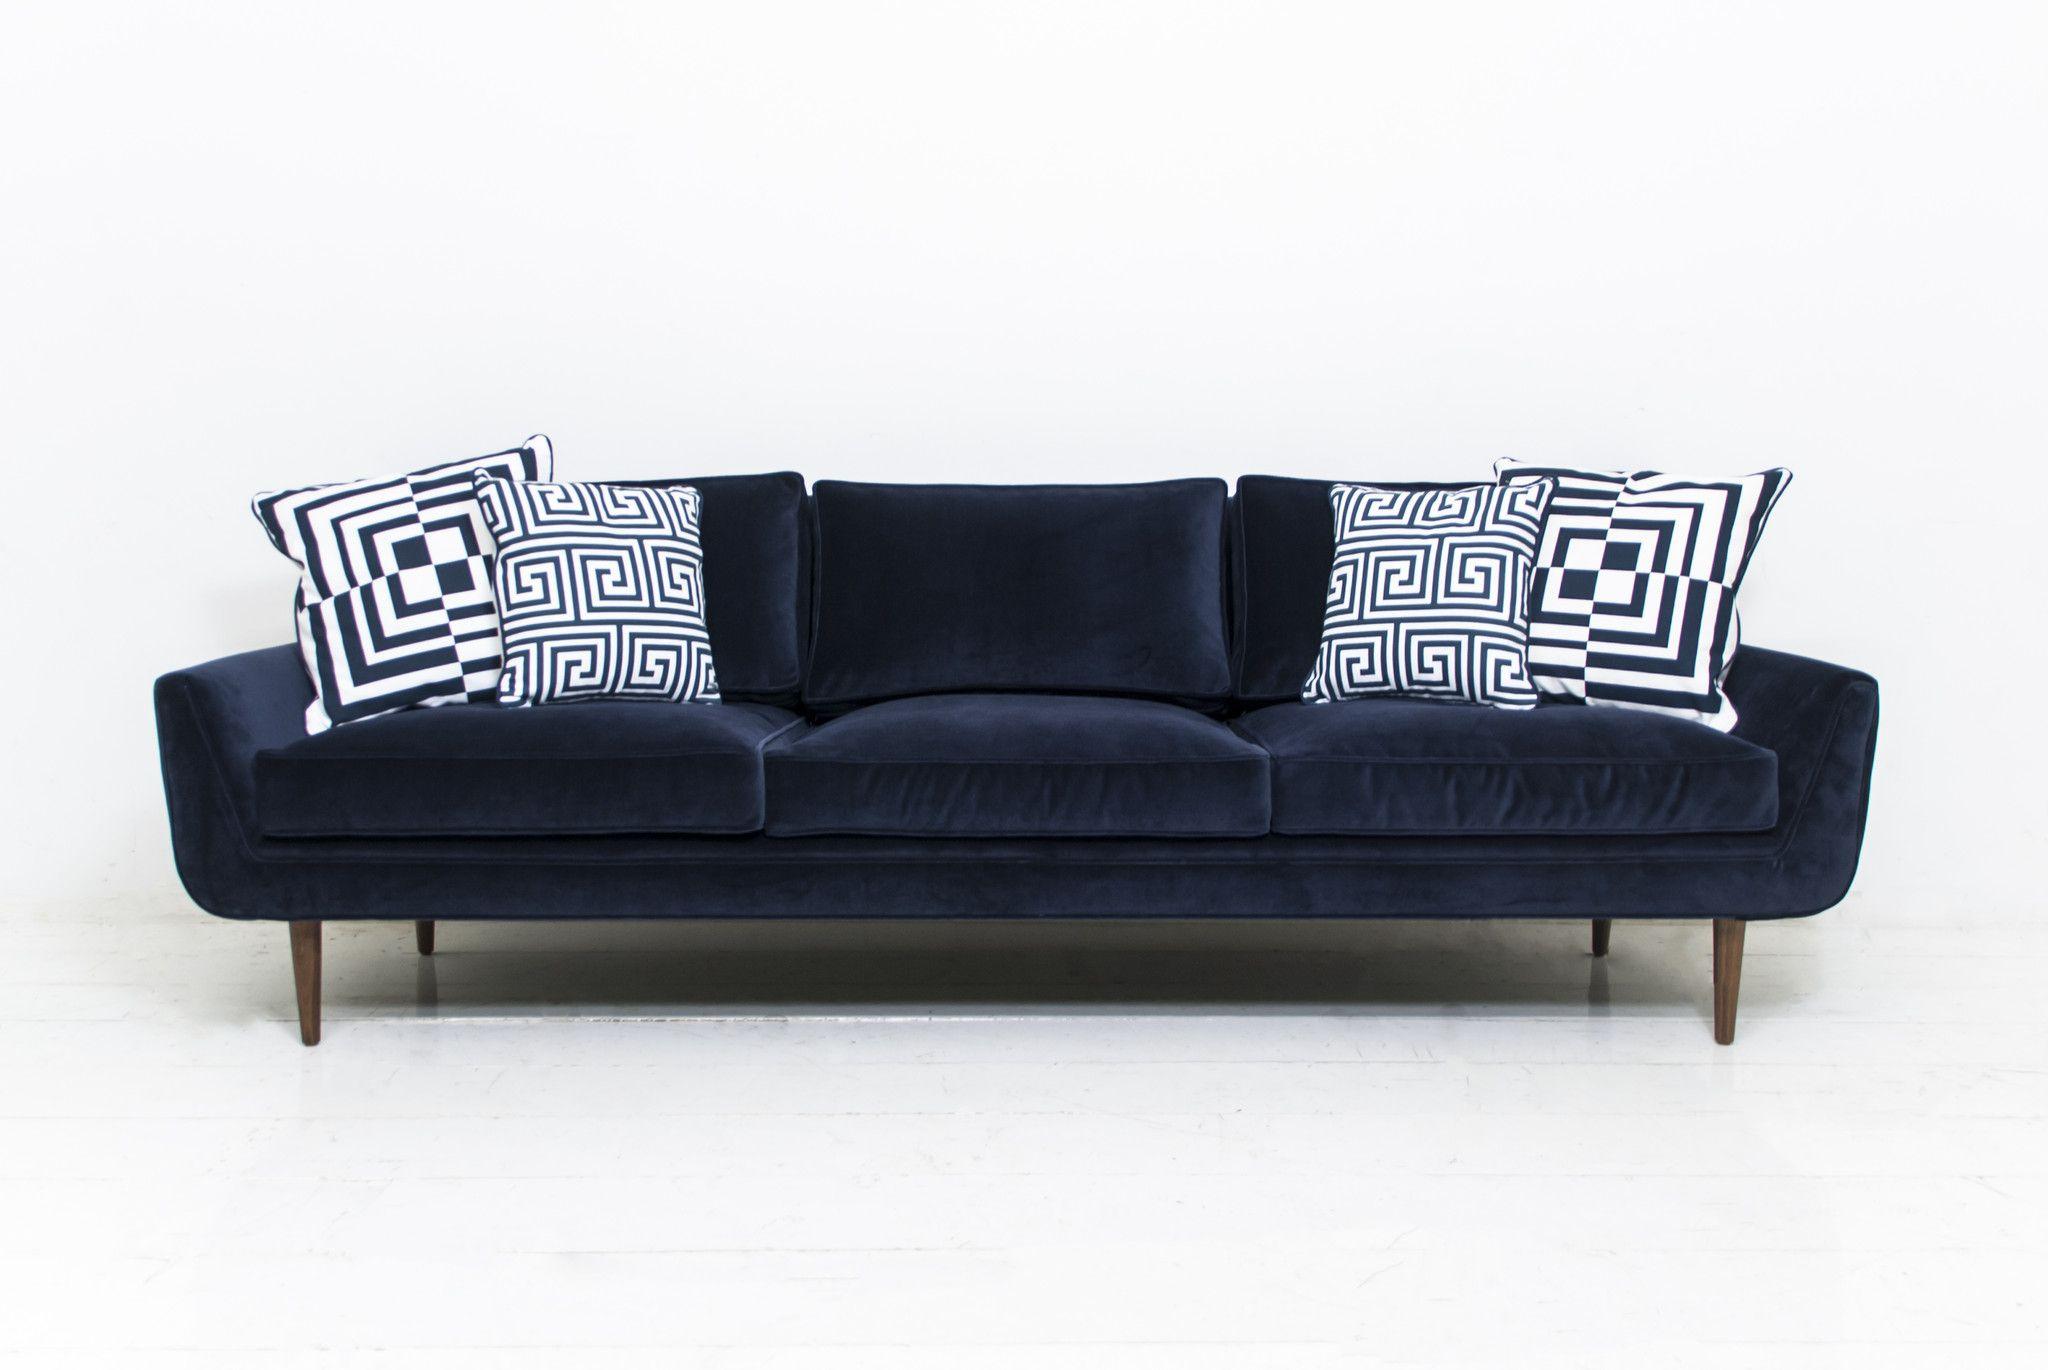 Stockholm Sofa in Navy Velvet | furniture | Modern sofa, Sofa ...